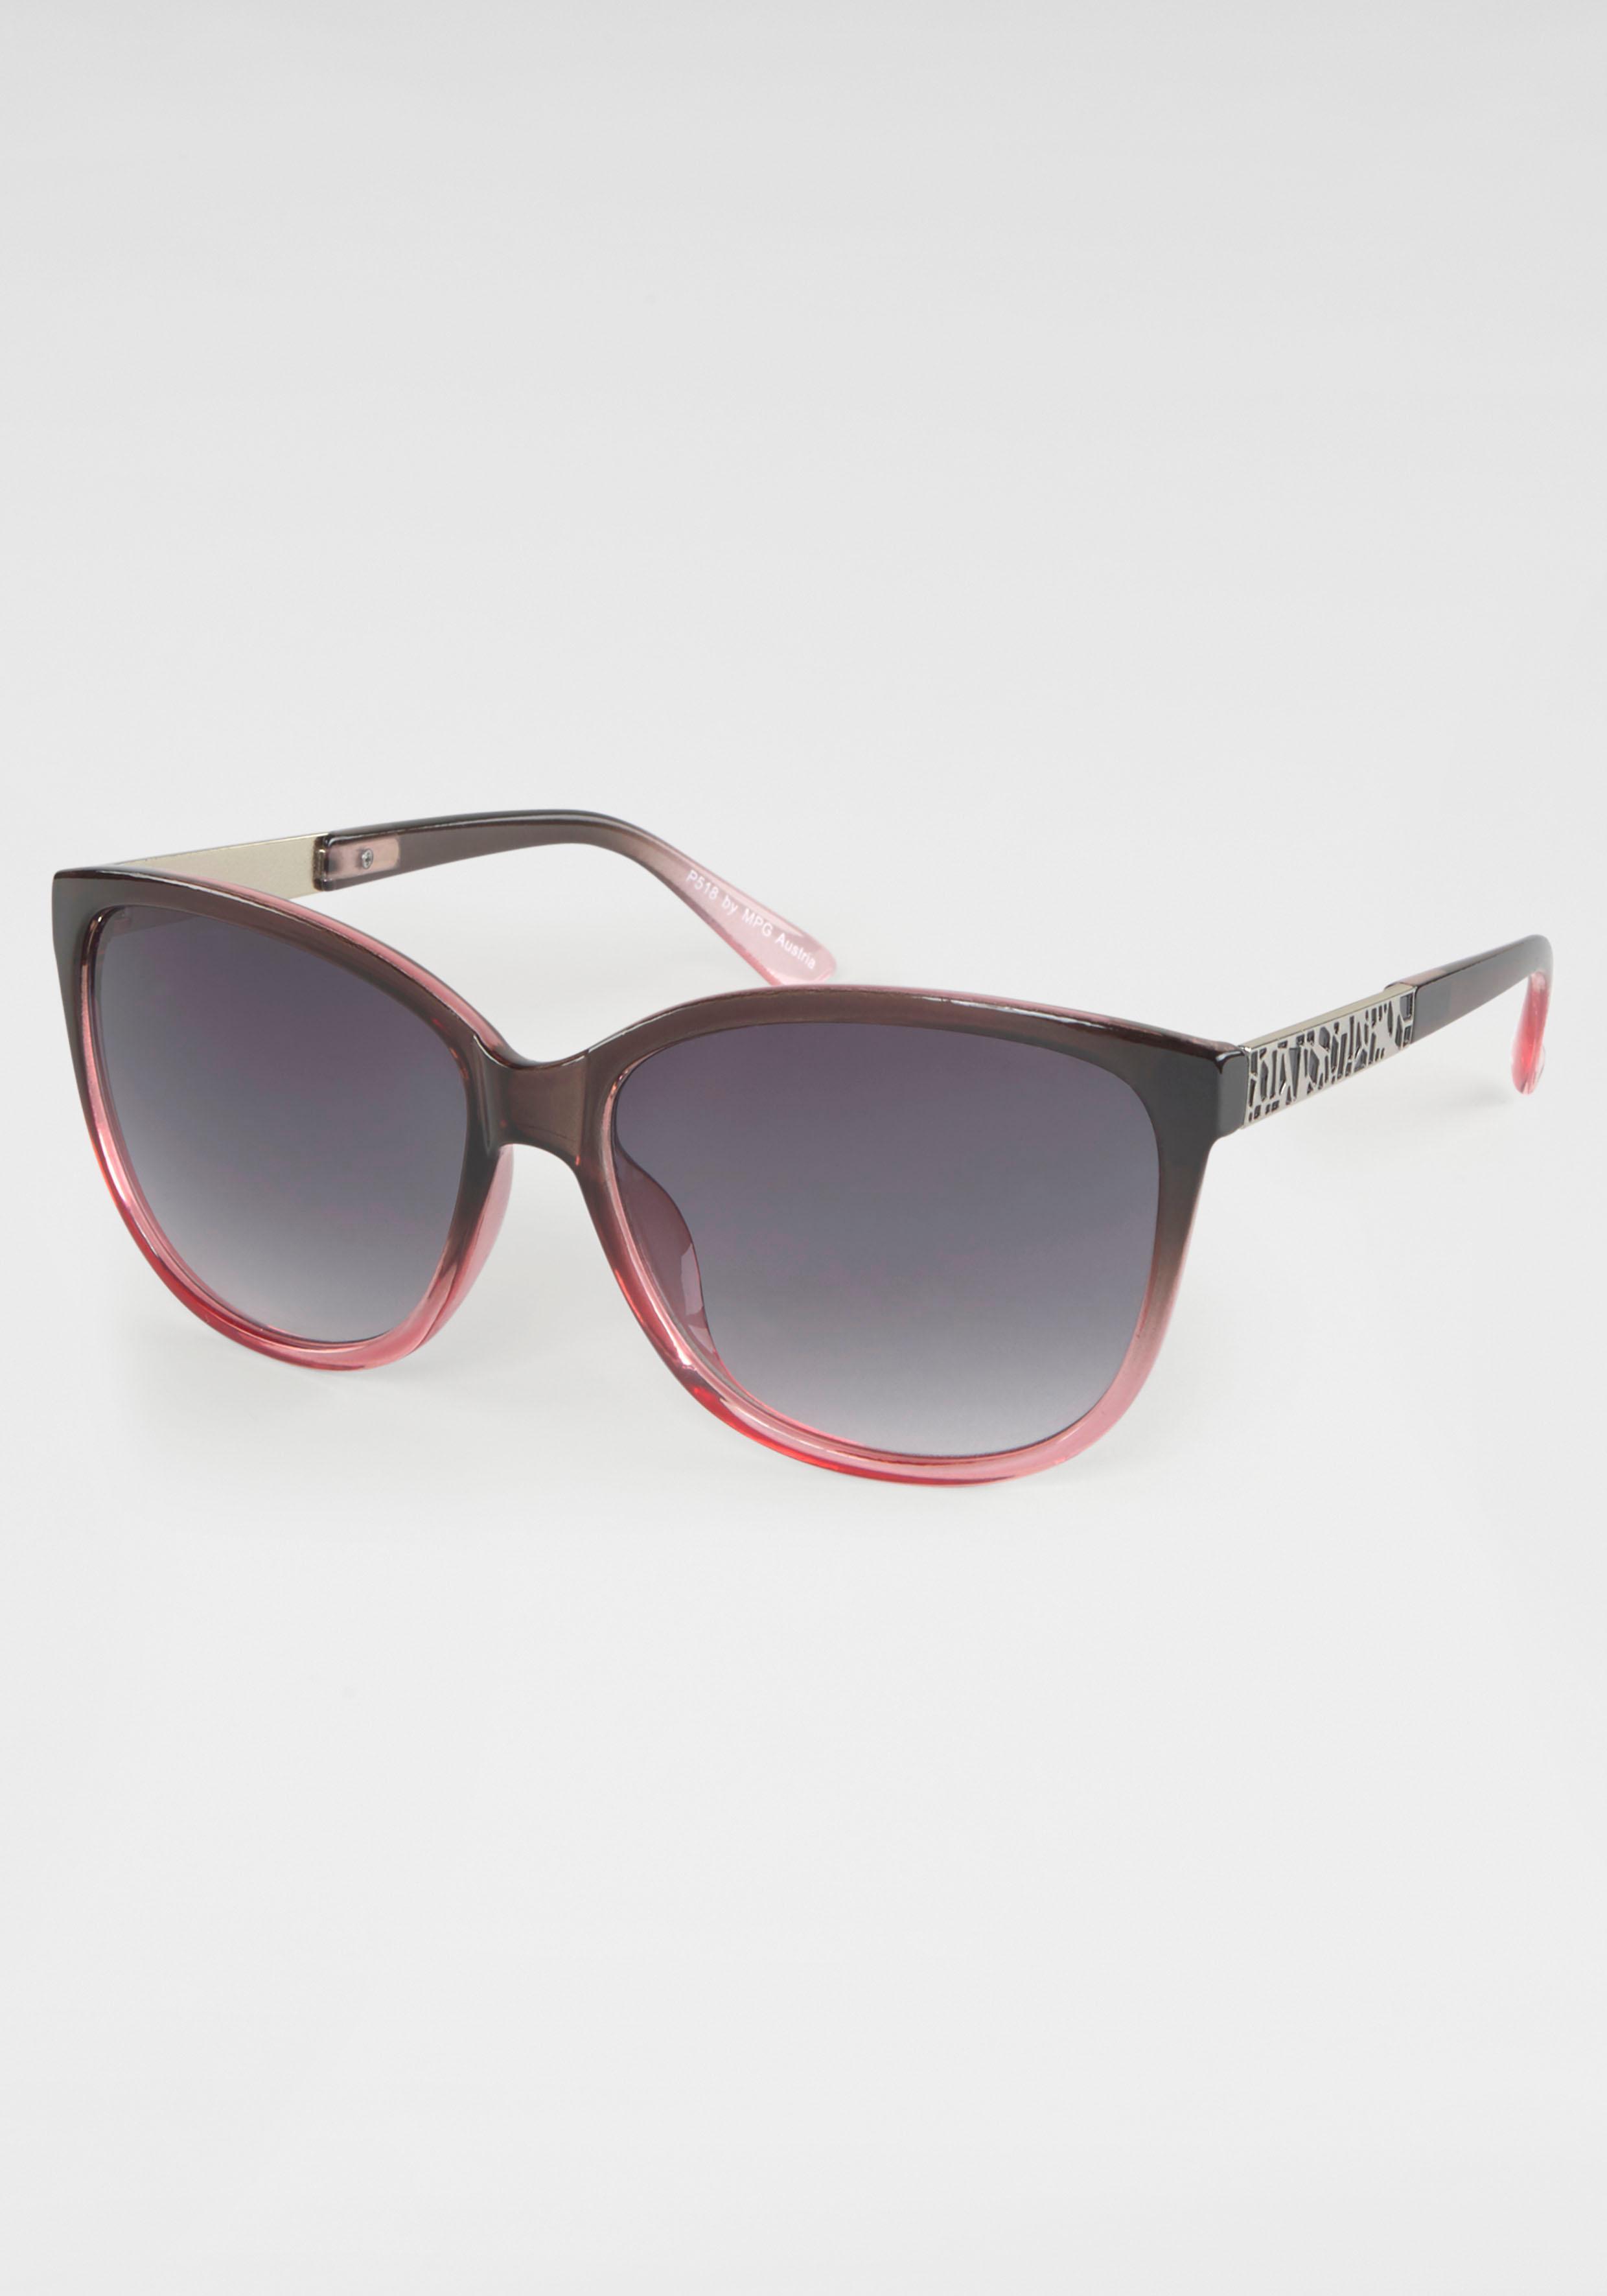 Sonnenbrille Damenmode/Schmuck & Accessoires/Accessoires/Sonnenbrillen/Ovale Sonnenbrille